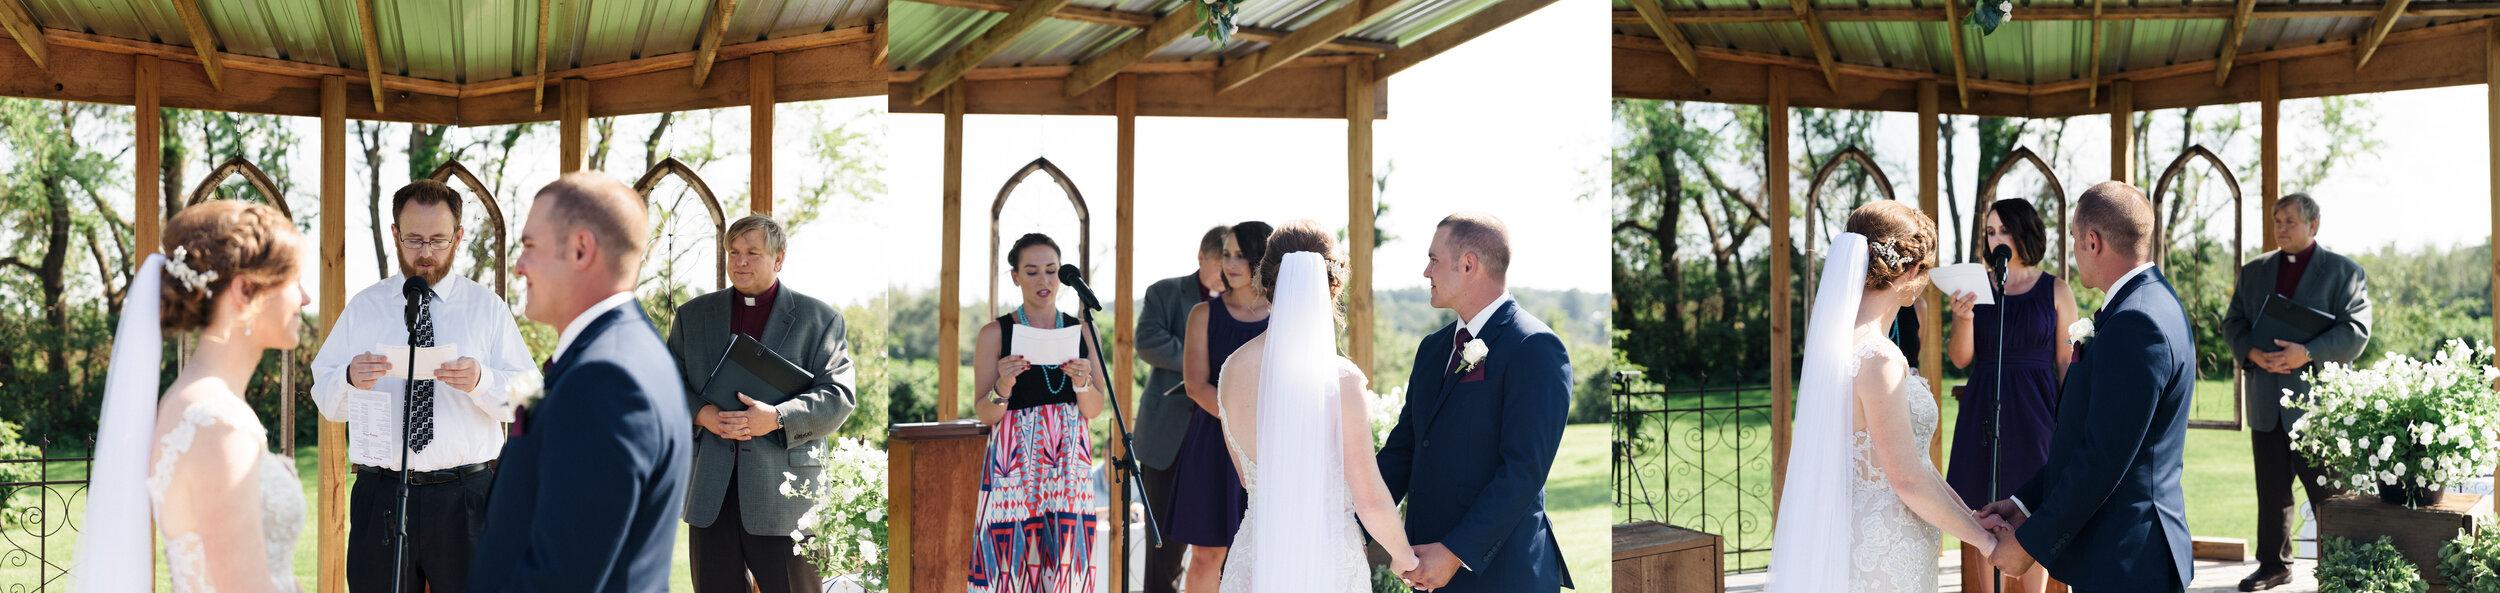 Ceremony06.jpg